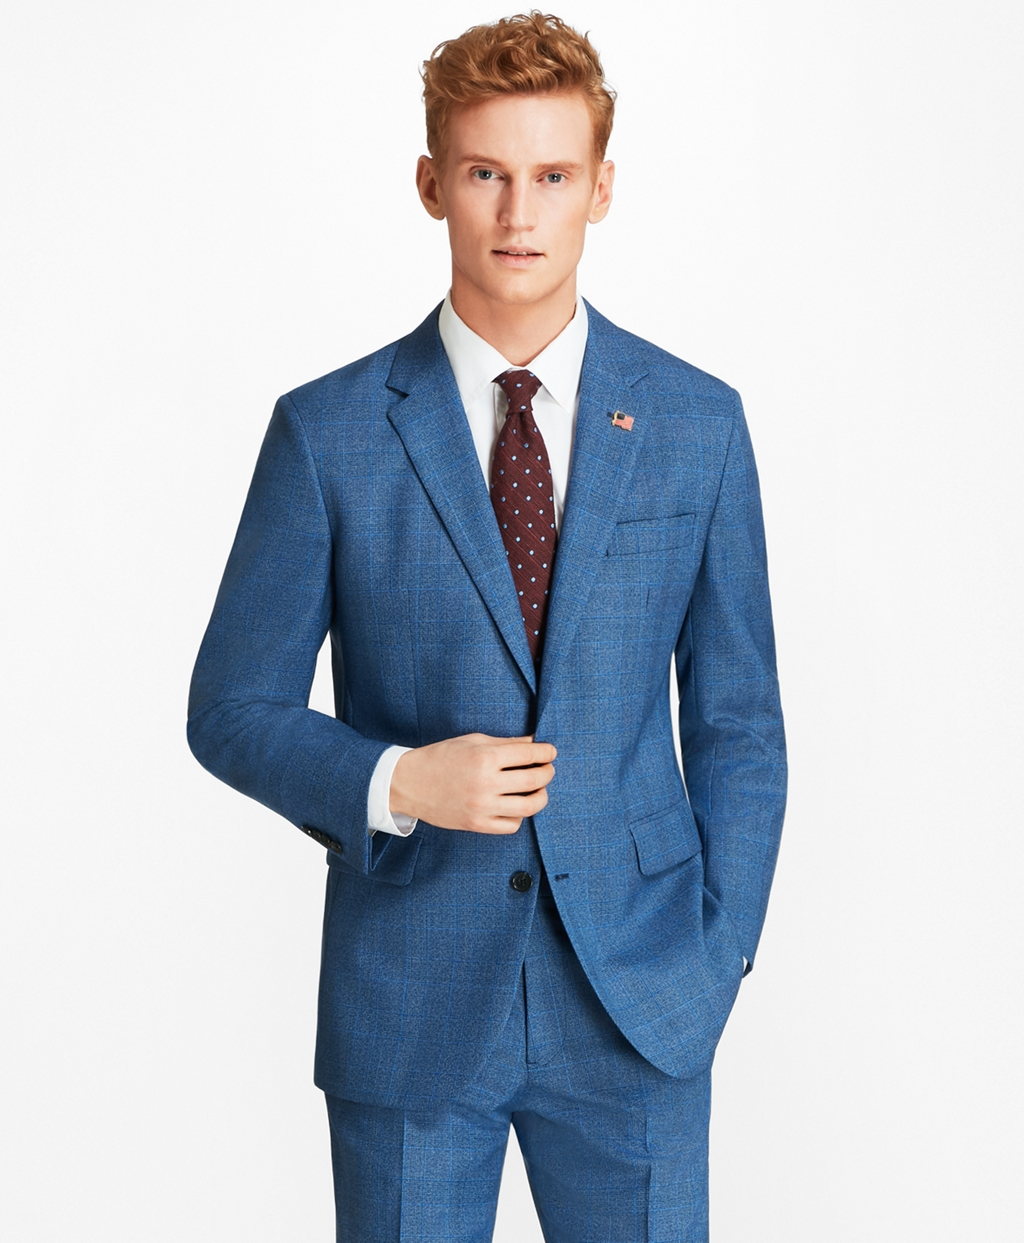 Retro Clothing for Men | Vintage Men's Fashion Brooks Brothers Mens Milano Fit Plaid 1818 Suit $499.00 AT vintagedancer.com